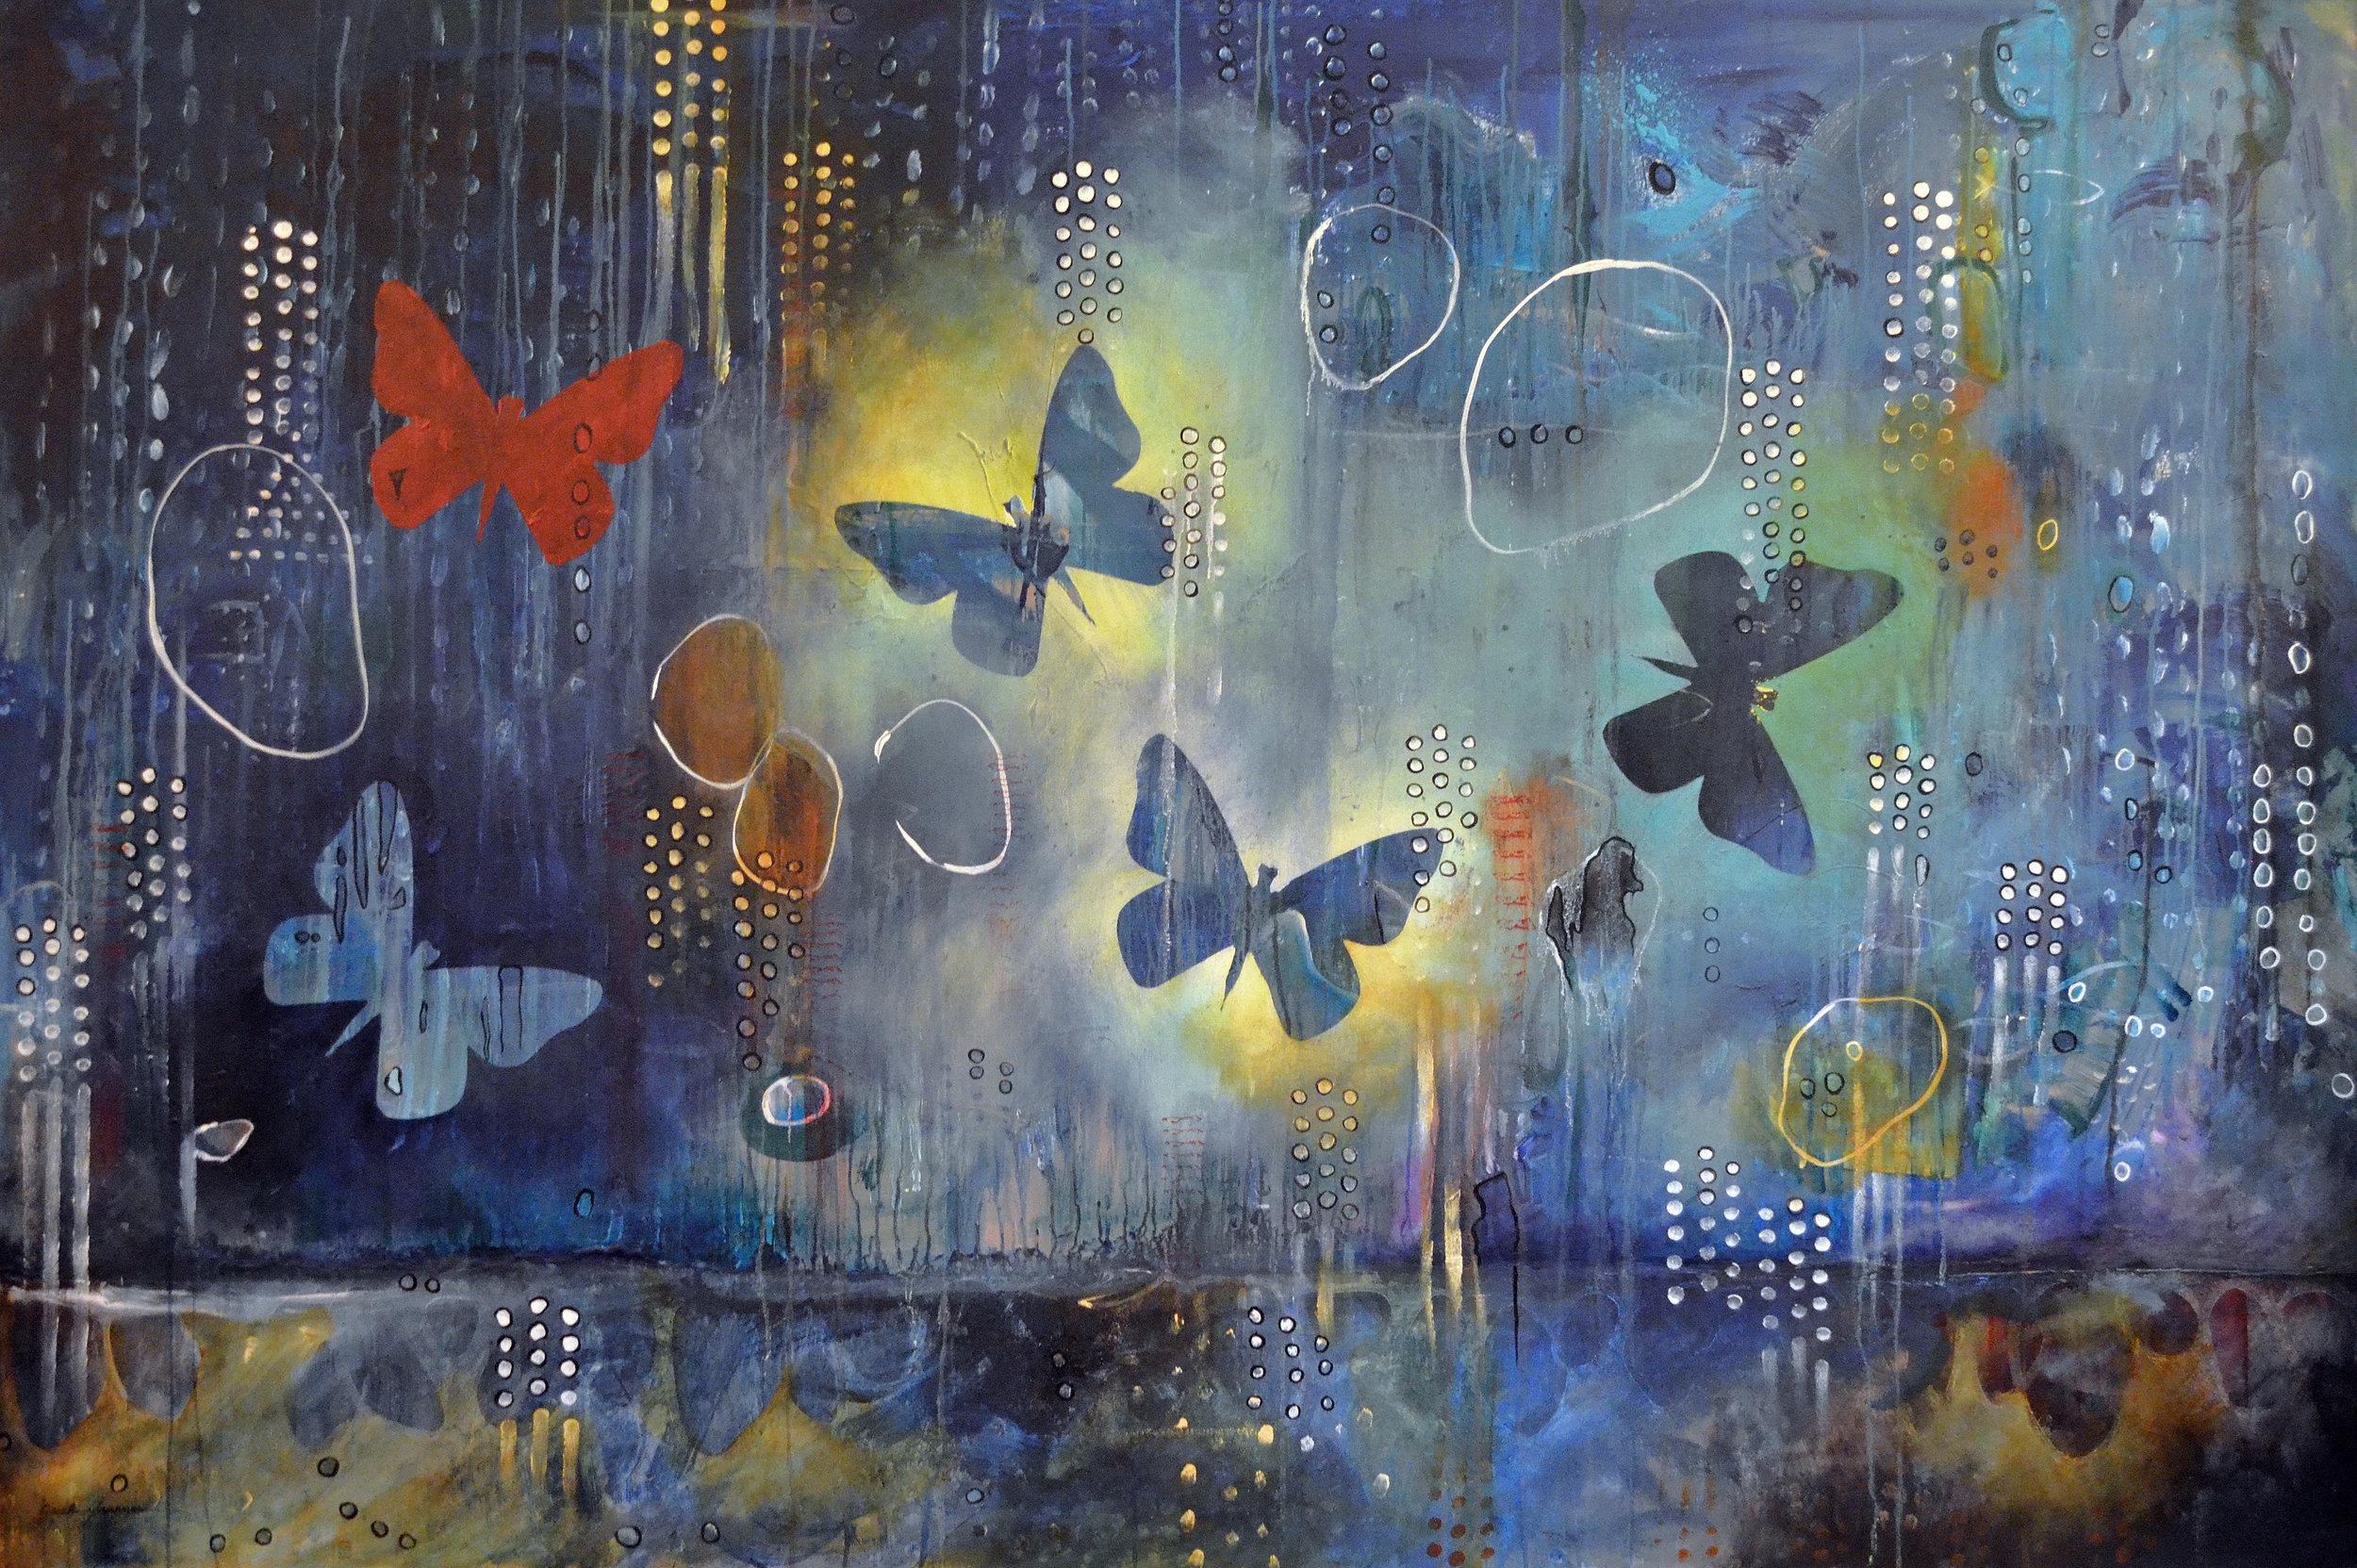 Flutter  | 48 x 60 inch acrylic on canvas